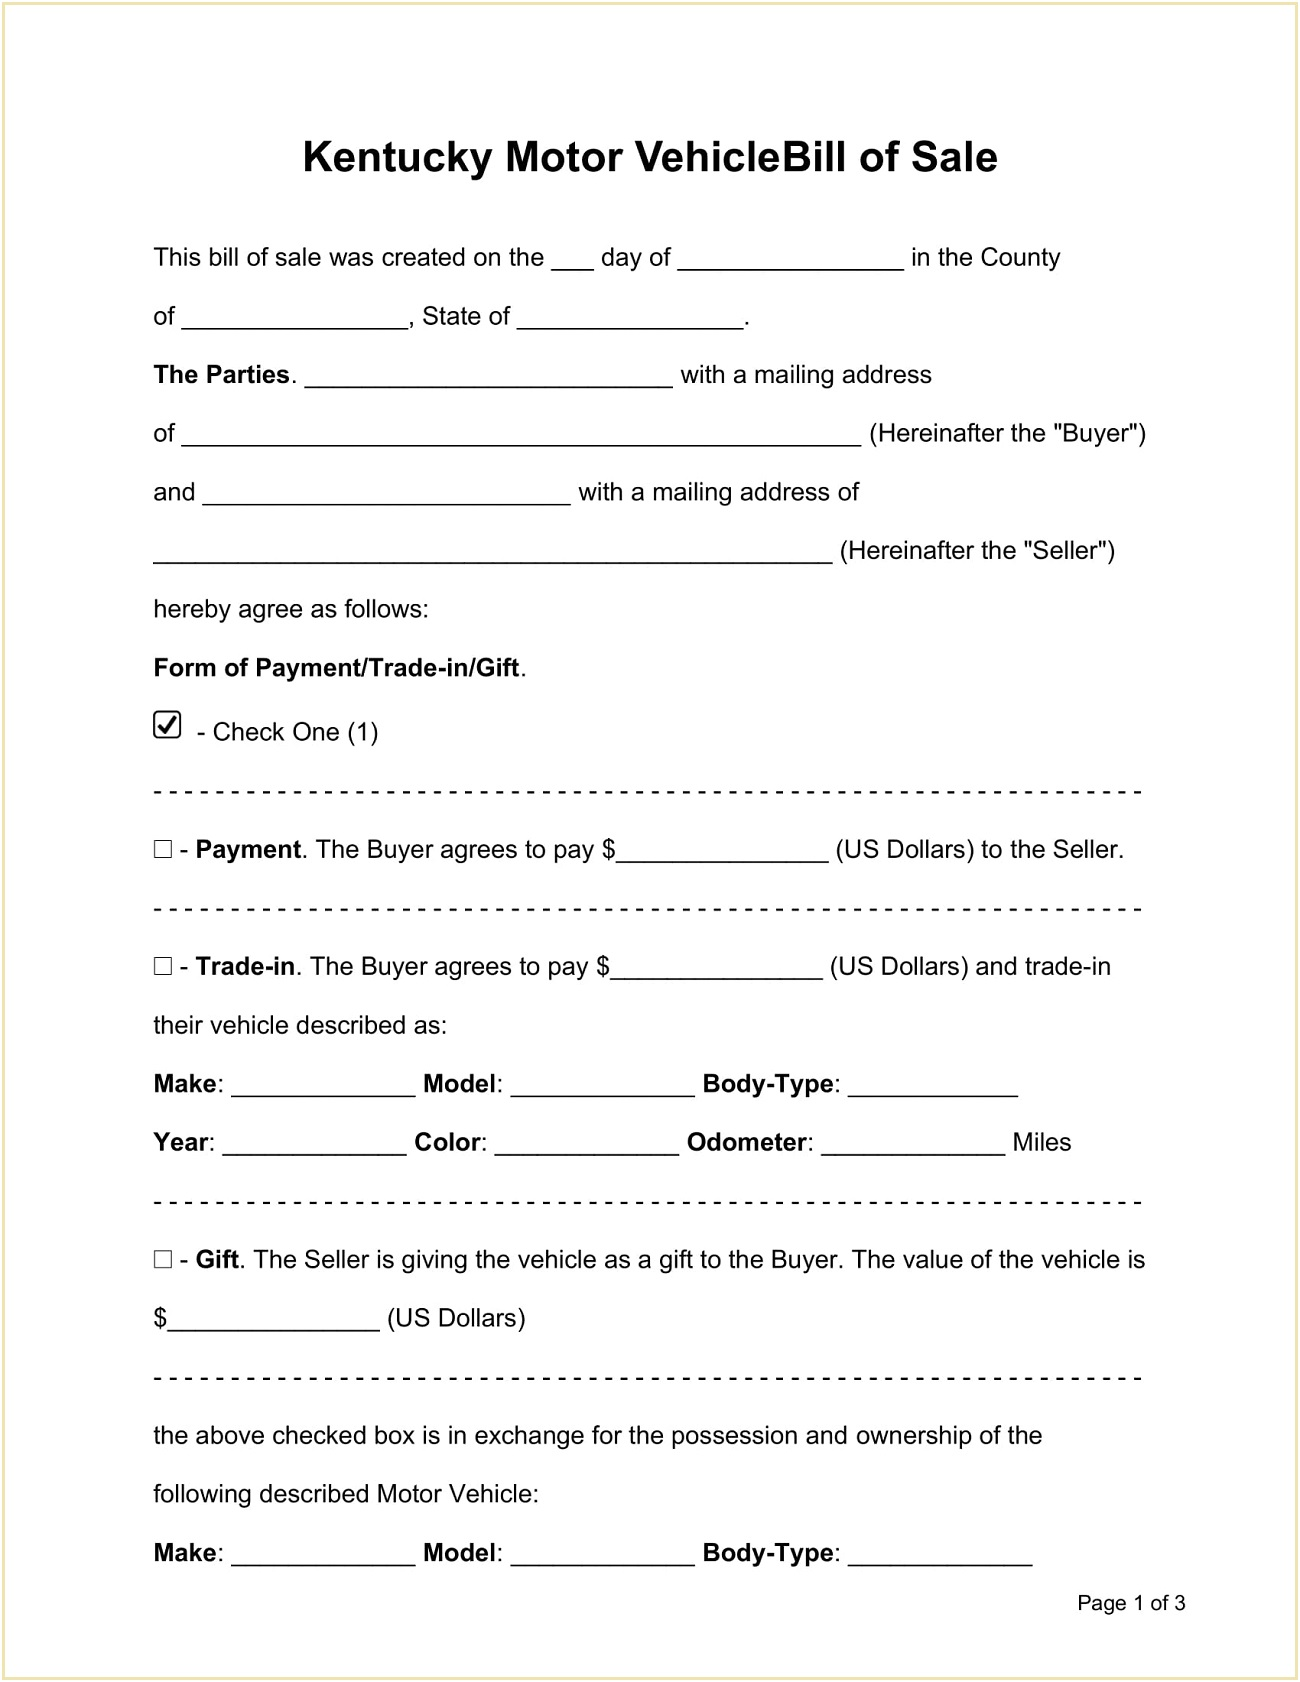 Kentucky Motor Vehicle Bill of Sale Form Template Word Doc